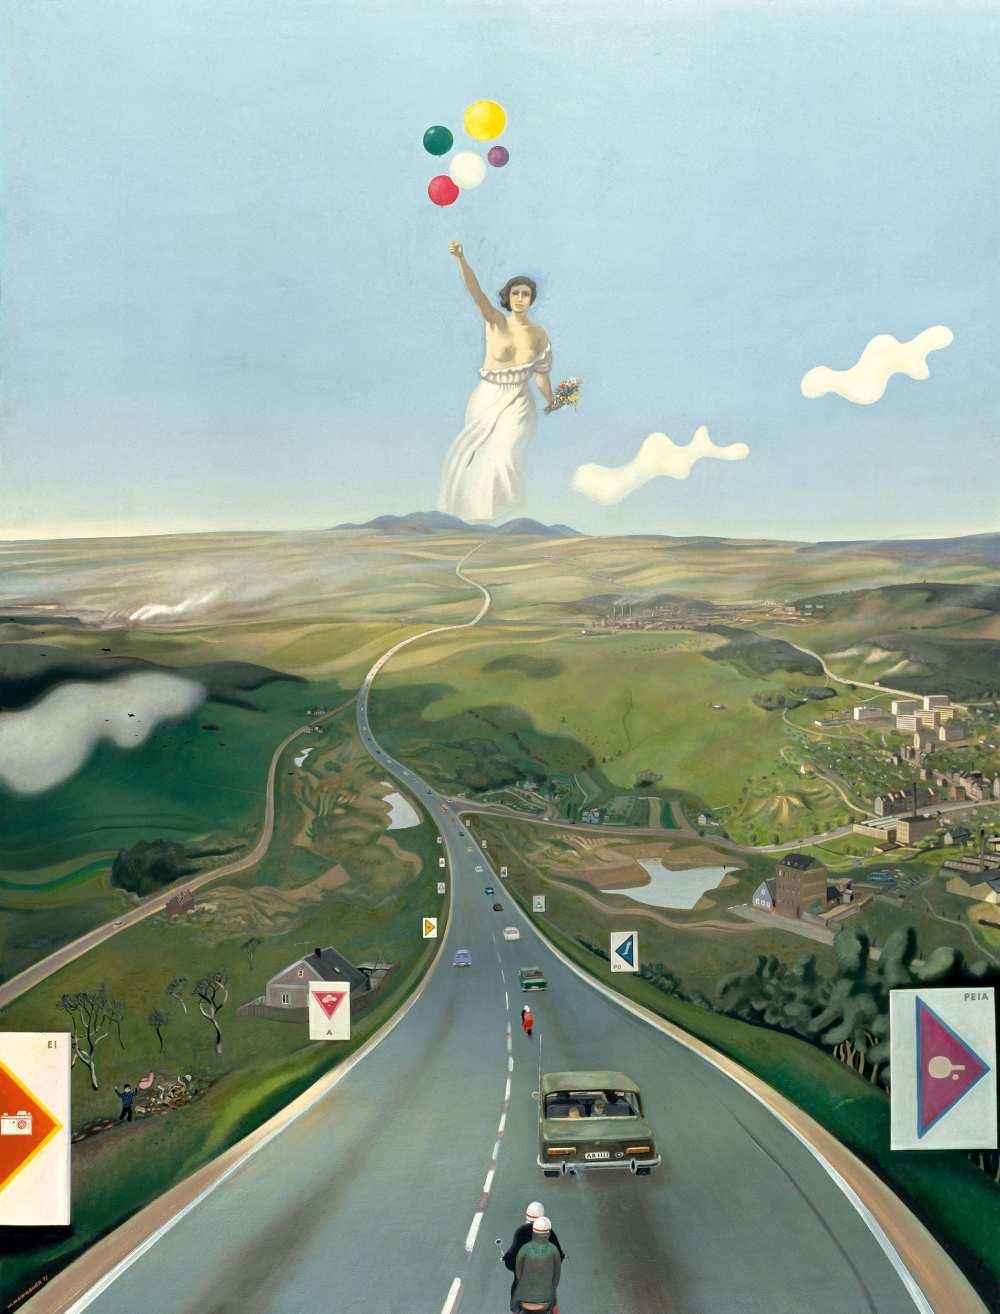 Wolfgang Mattheuer, Hinter den 7 Bergen, 1973, Öl auf Hartfaser, 170 x 130 cm